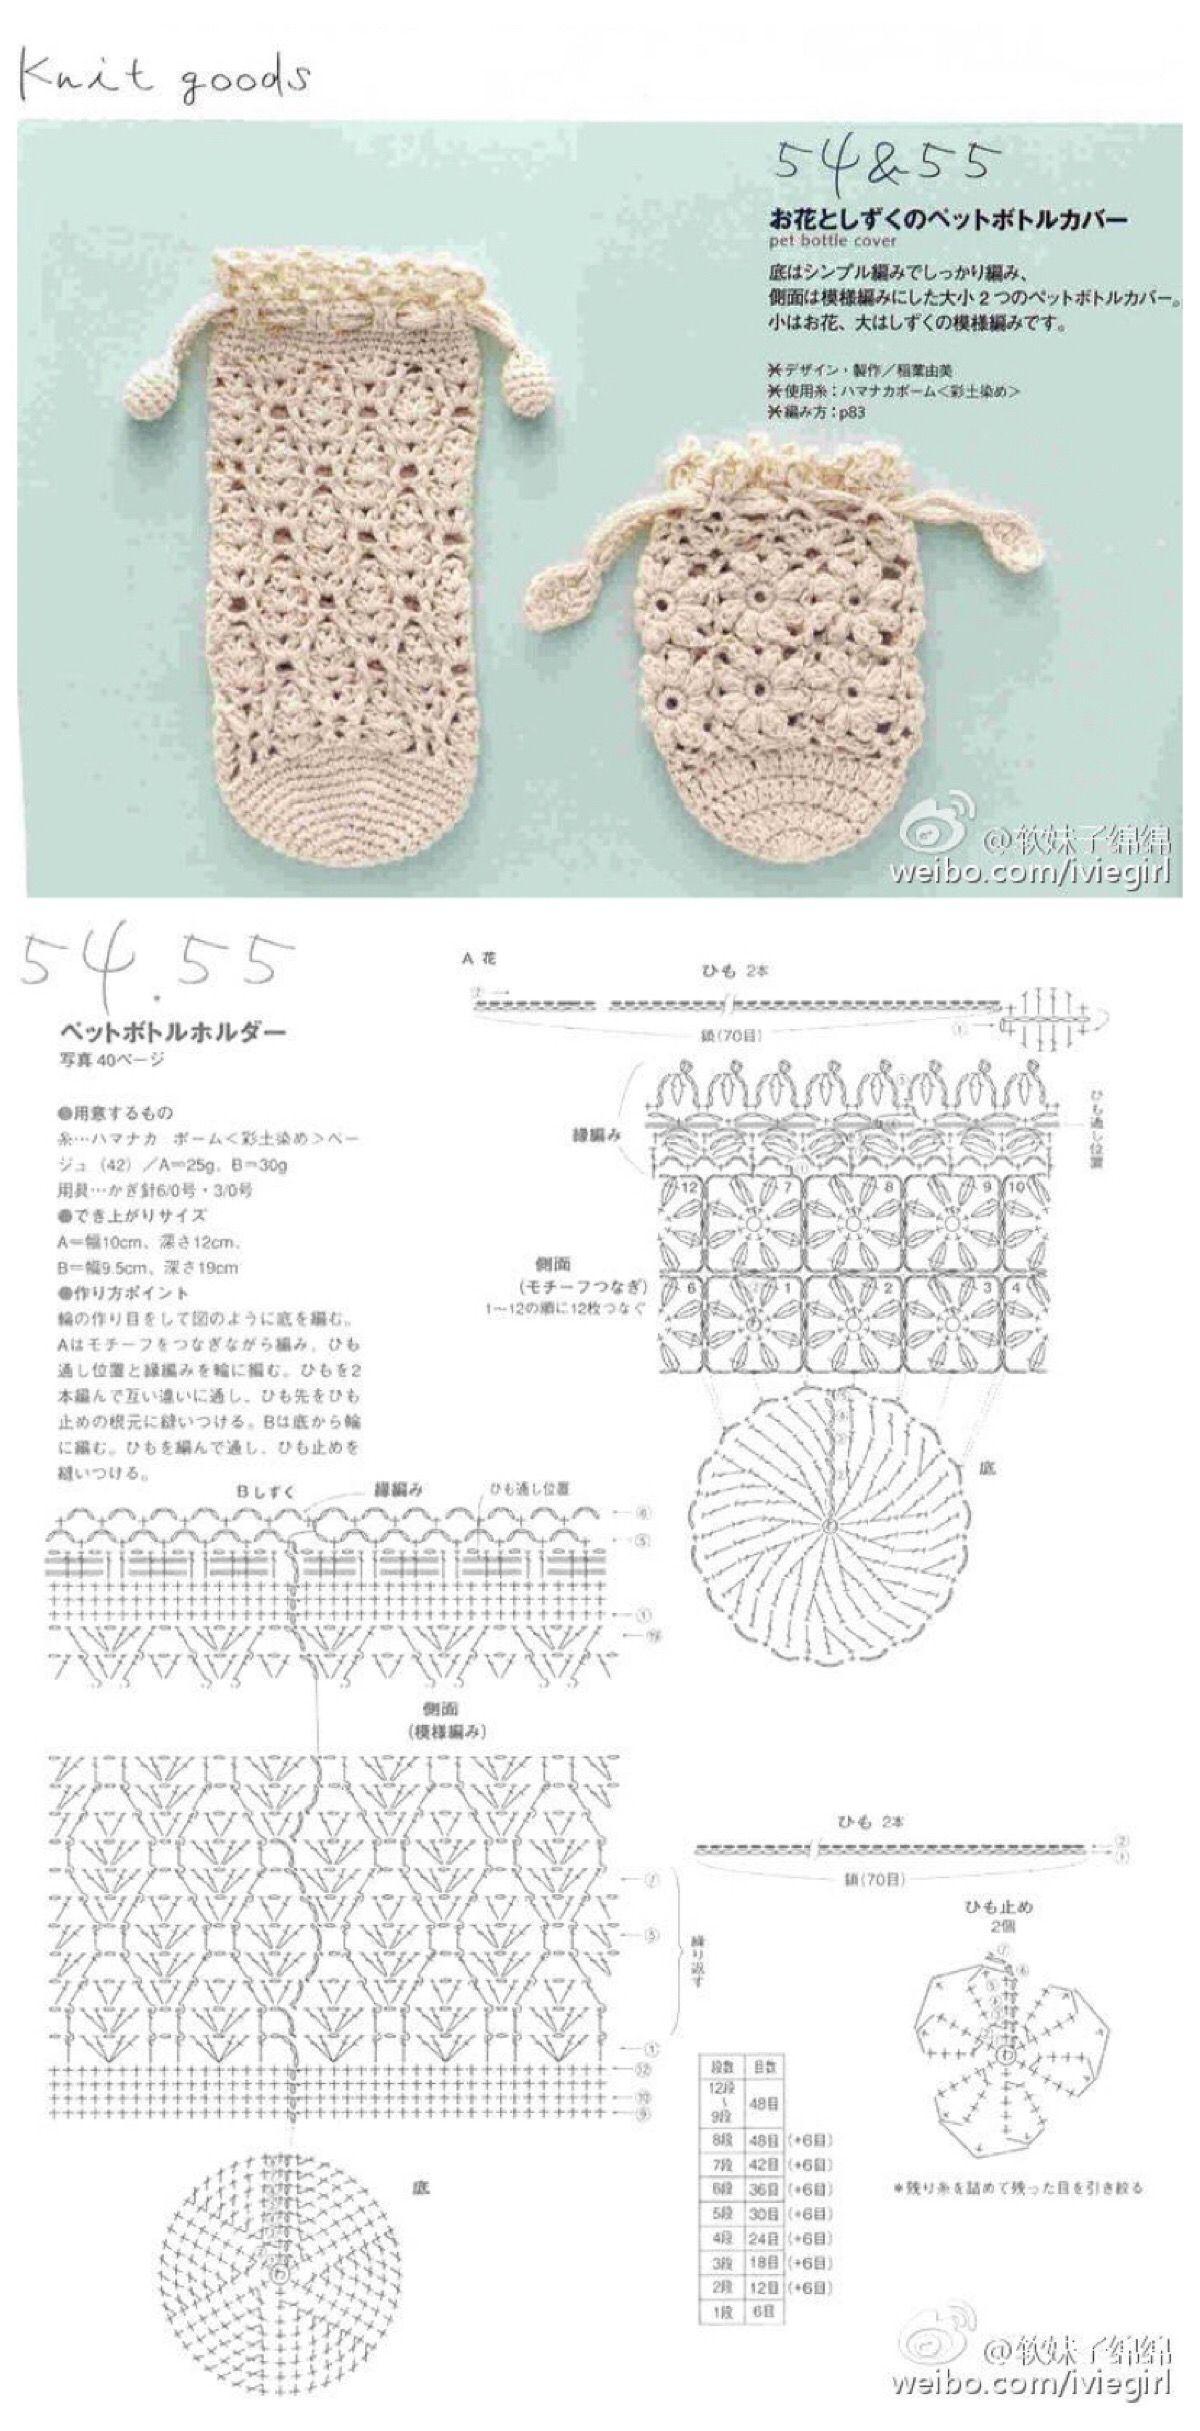 Bag crochet | Chart crochet | Pinterest | Bolsos, Ganchillo y Tejido